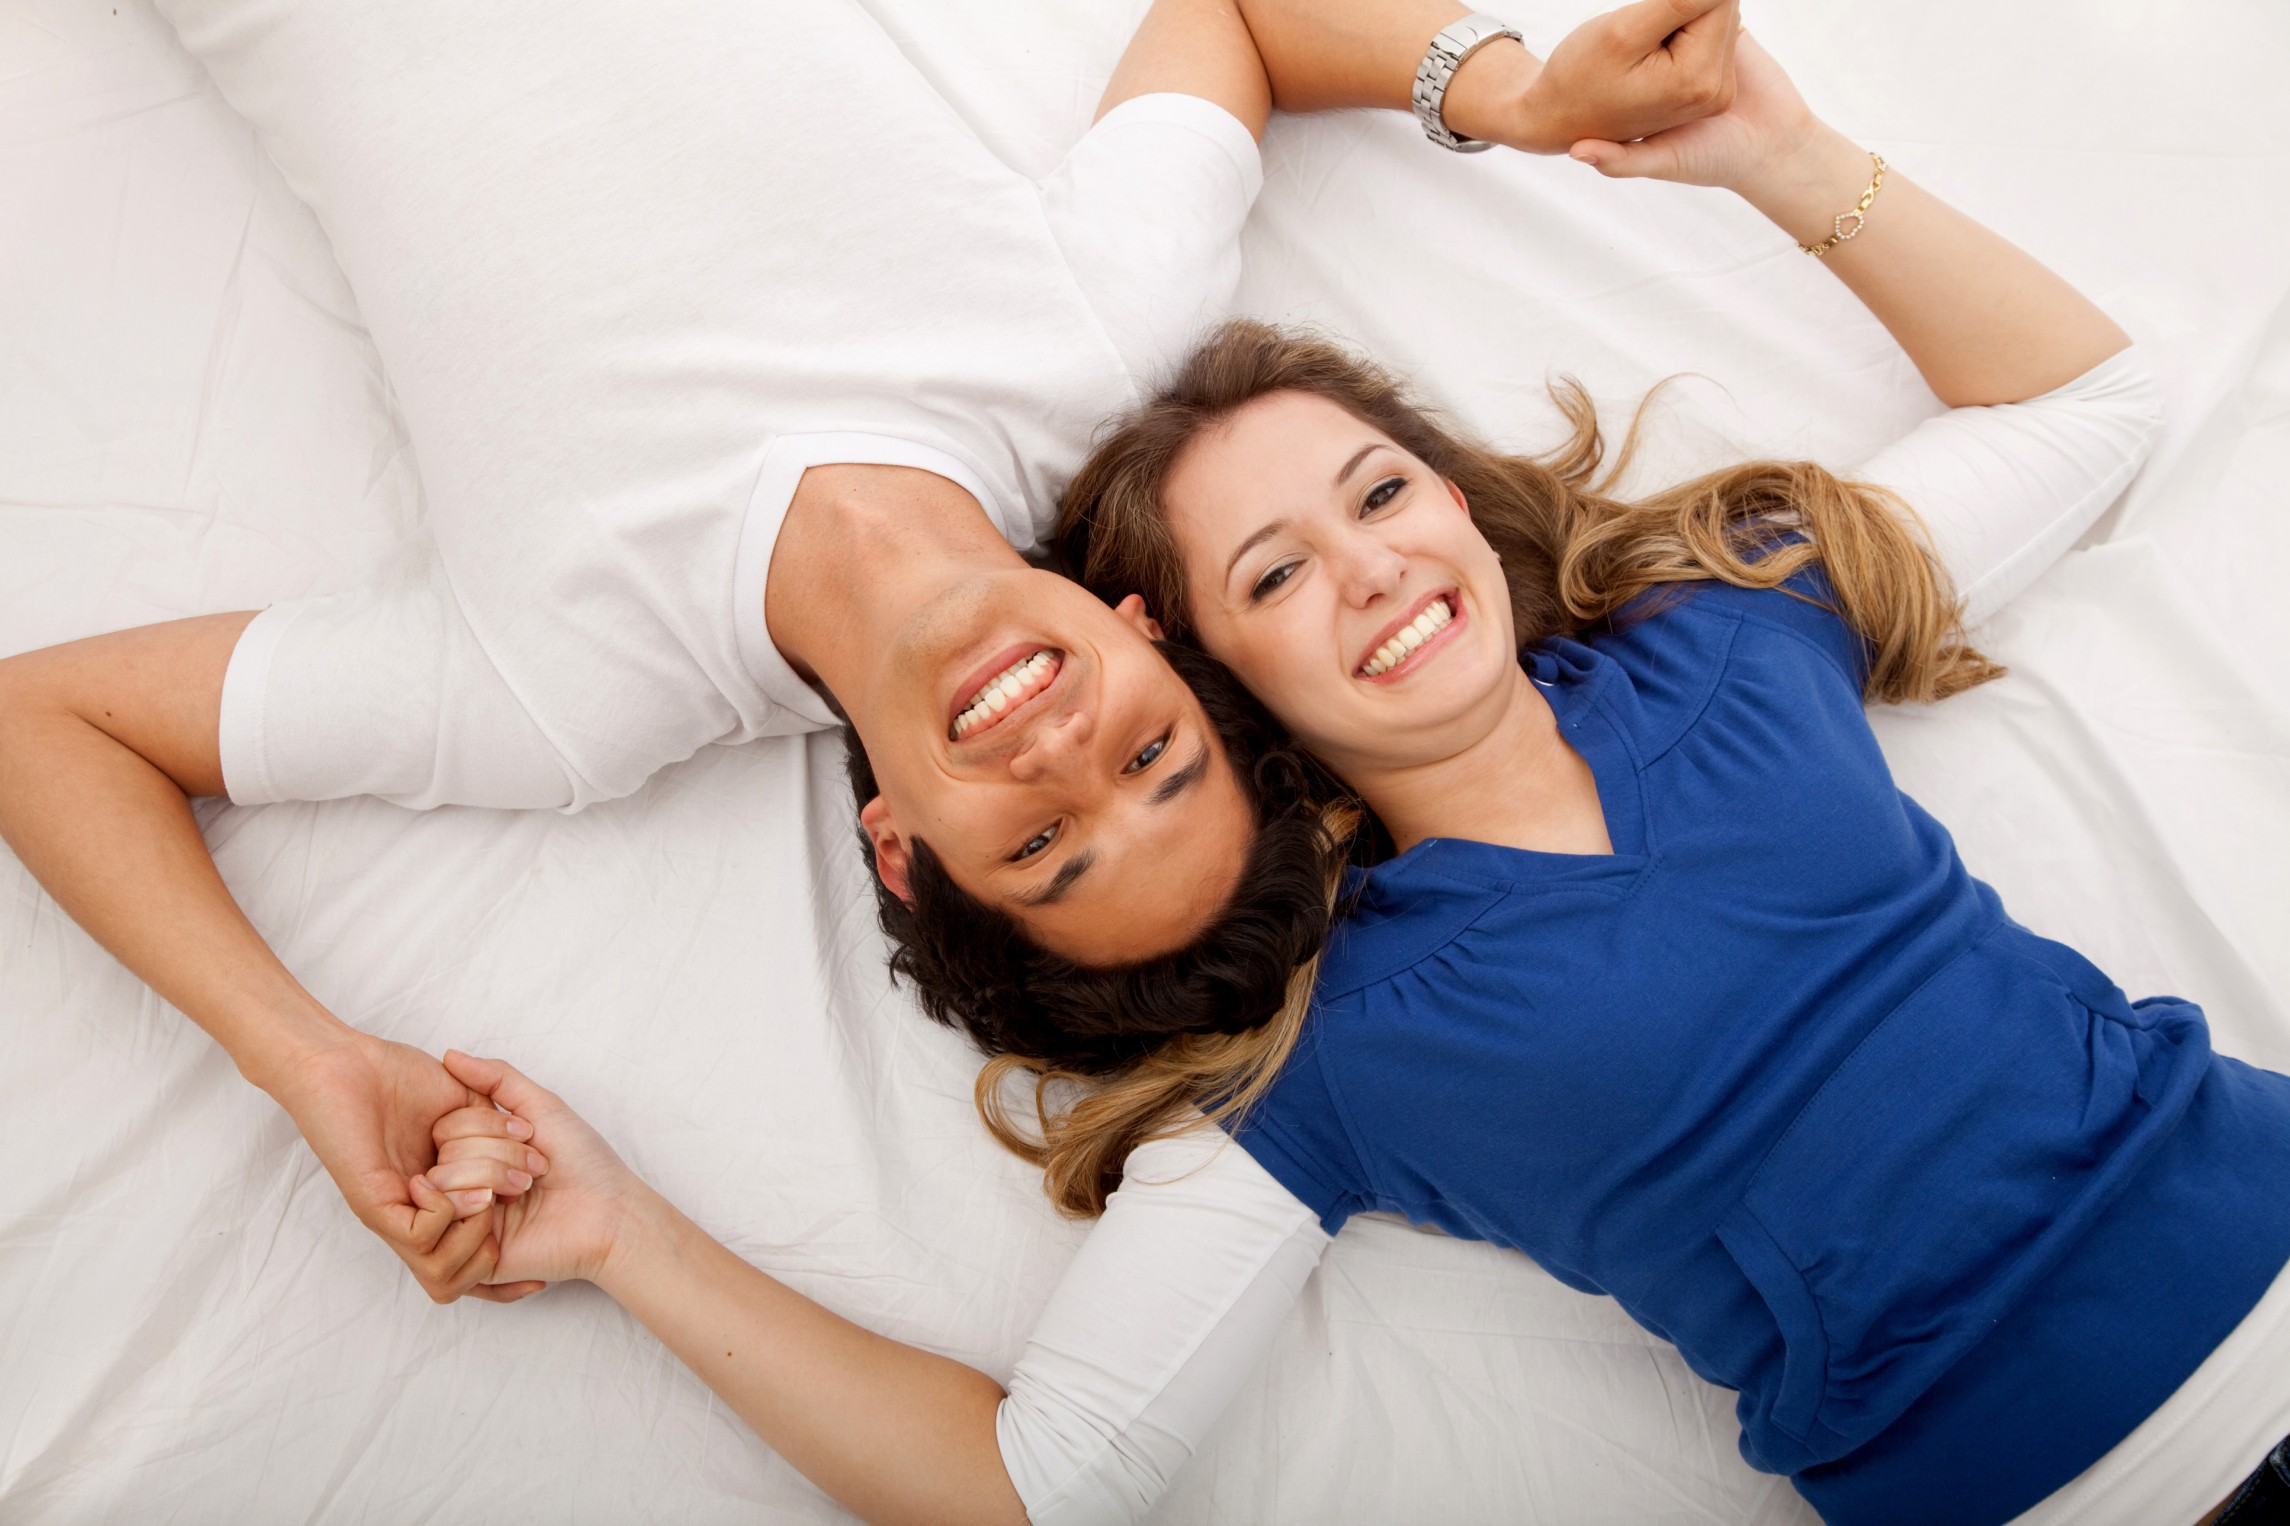 10 فایده شگفت انگیز رابطه جنسی